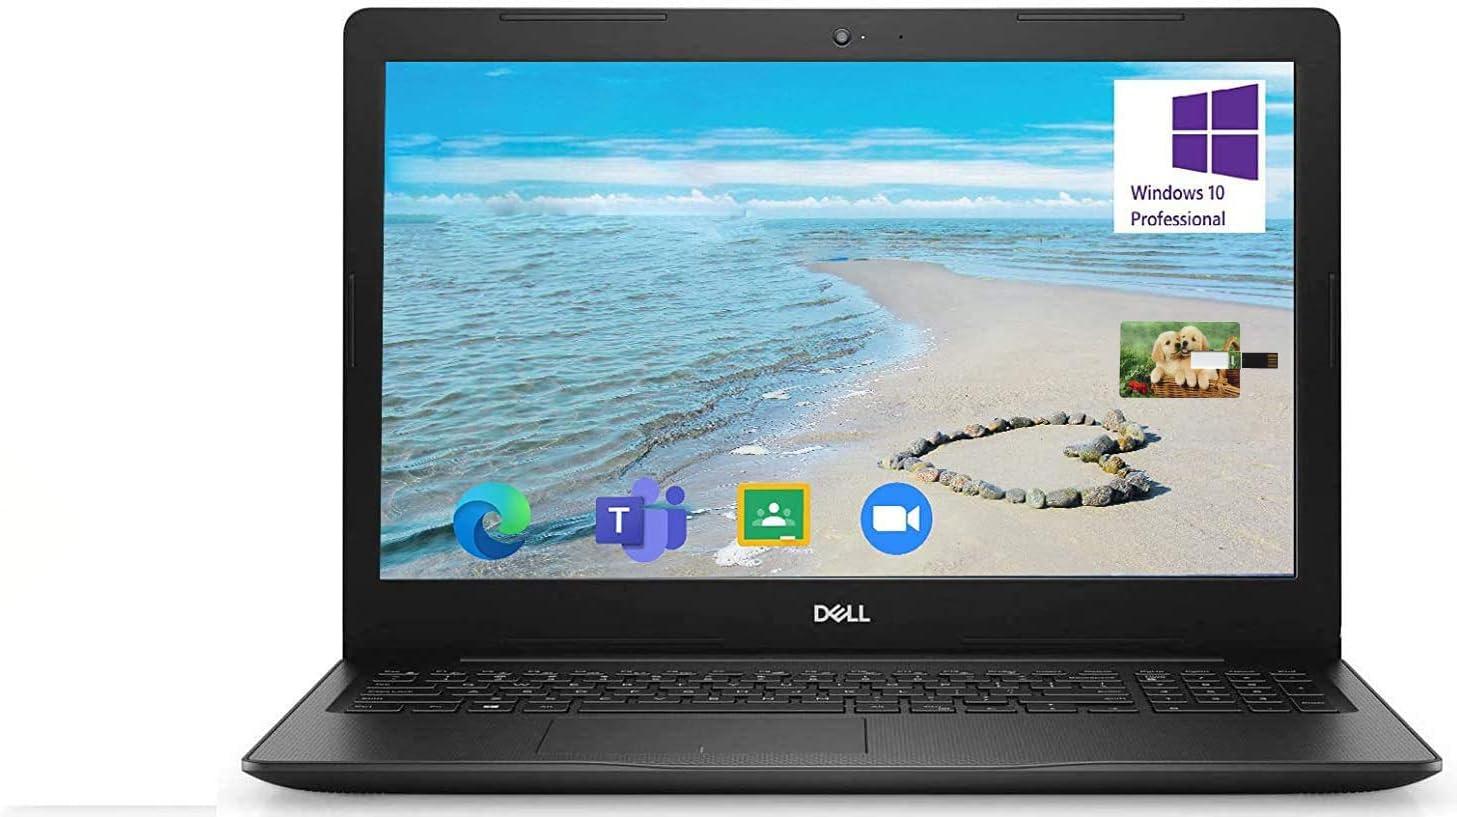 Dell Inspiron 15.6 inch Laptop, 10th Gen Intel Core i5-1035G1, 16GB RAM, 512GB SSD, Windows 10 Pro, for Business; HDMI, WiFi, Intel UHD Graphics, Bluetooth, Online Class, Webcam